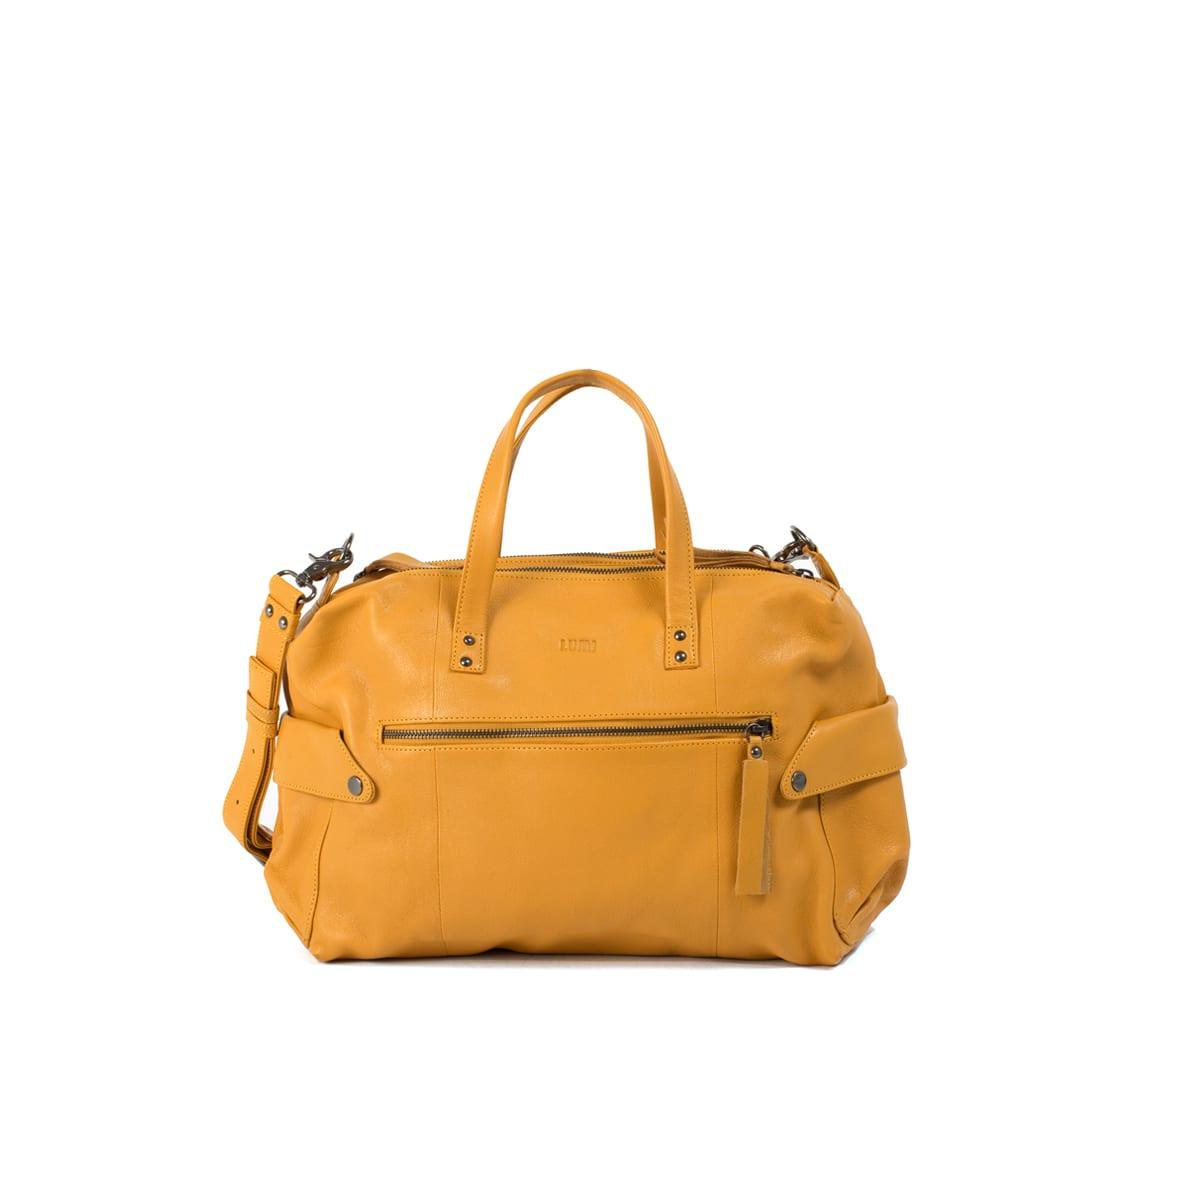 Lumi Laukku M : Nelli satchel mellow yellow lumi accessories